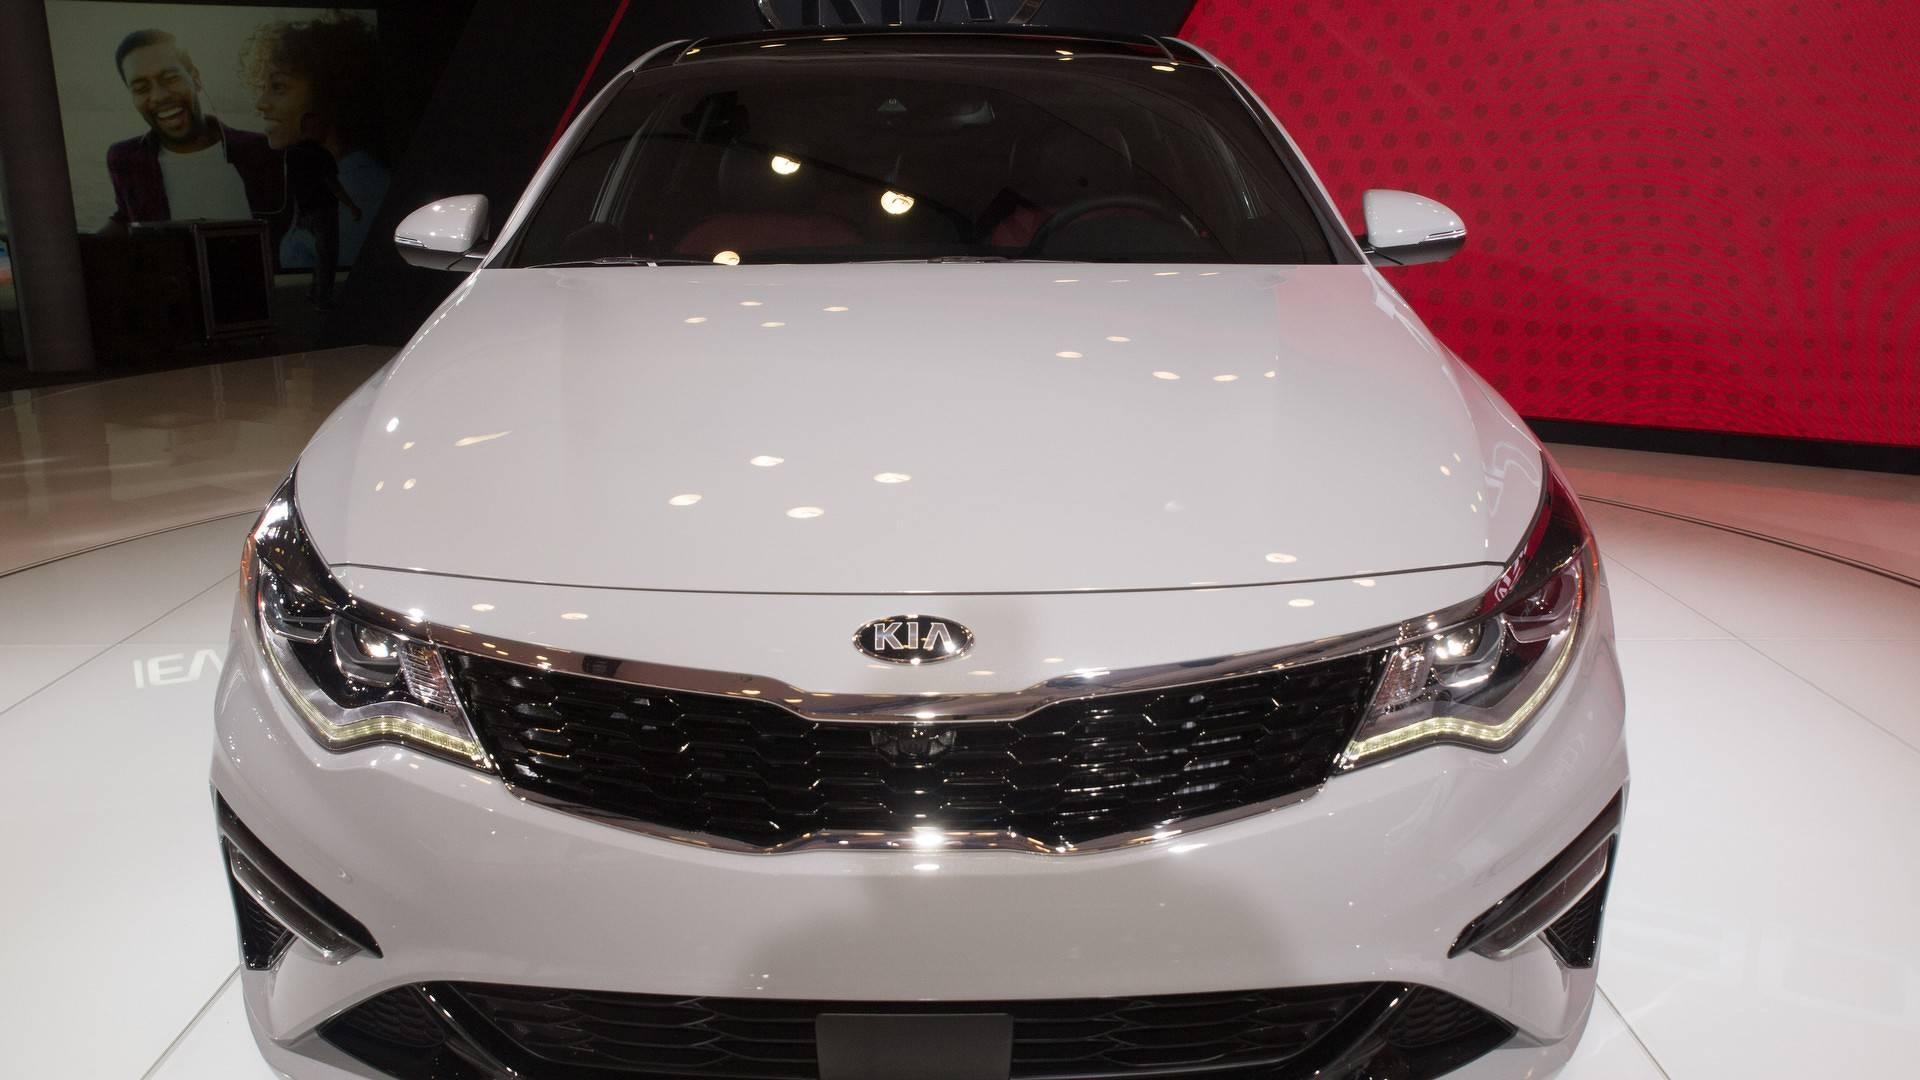 2019 Kia Optima Gets Very Minor Trim Refresh, Tech Update